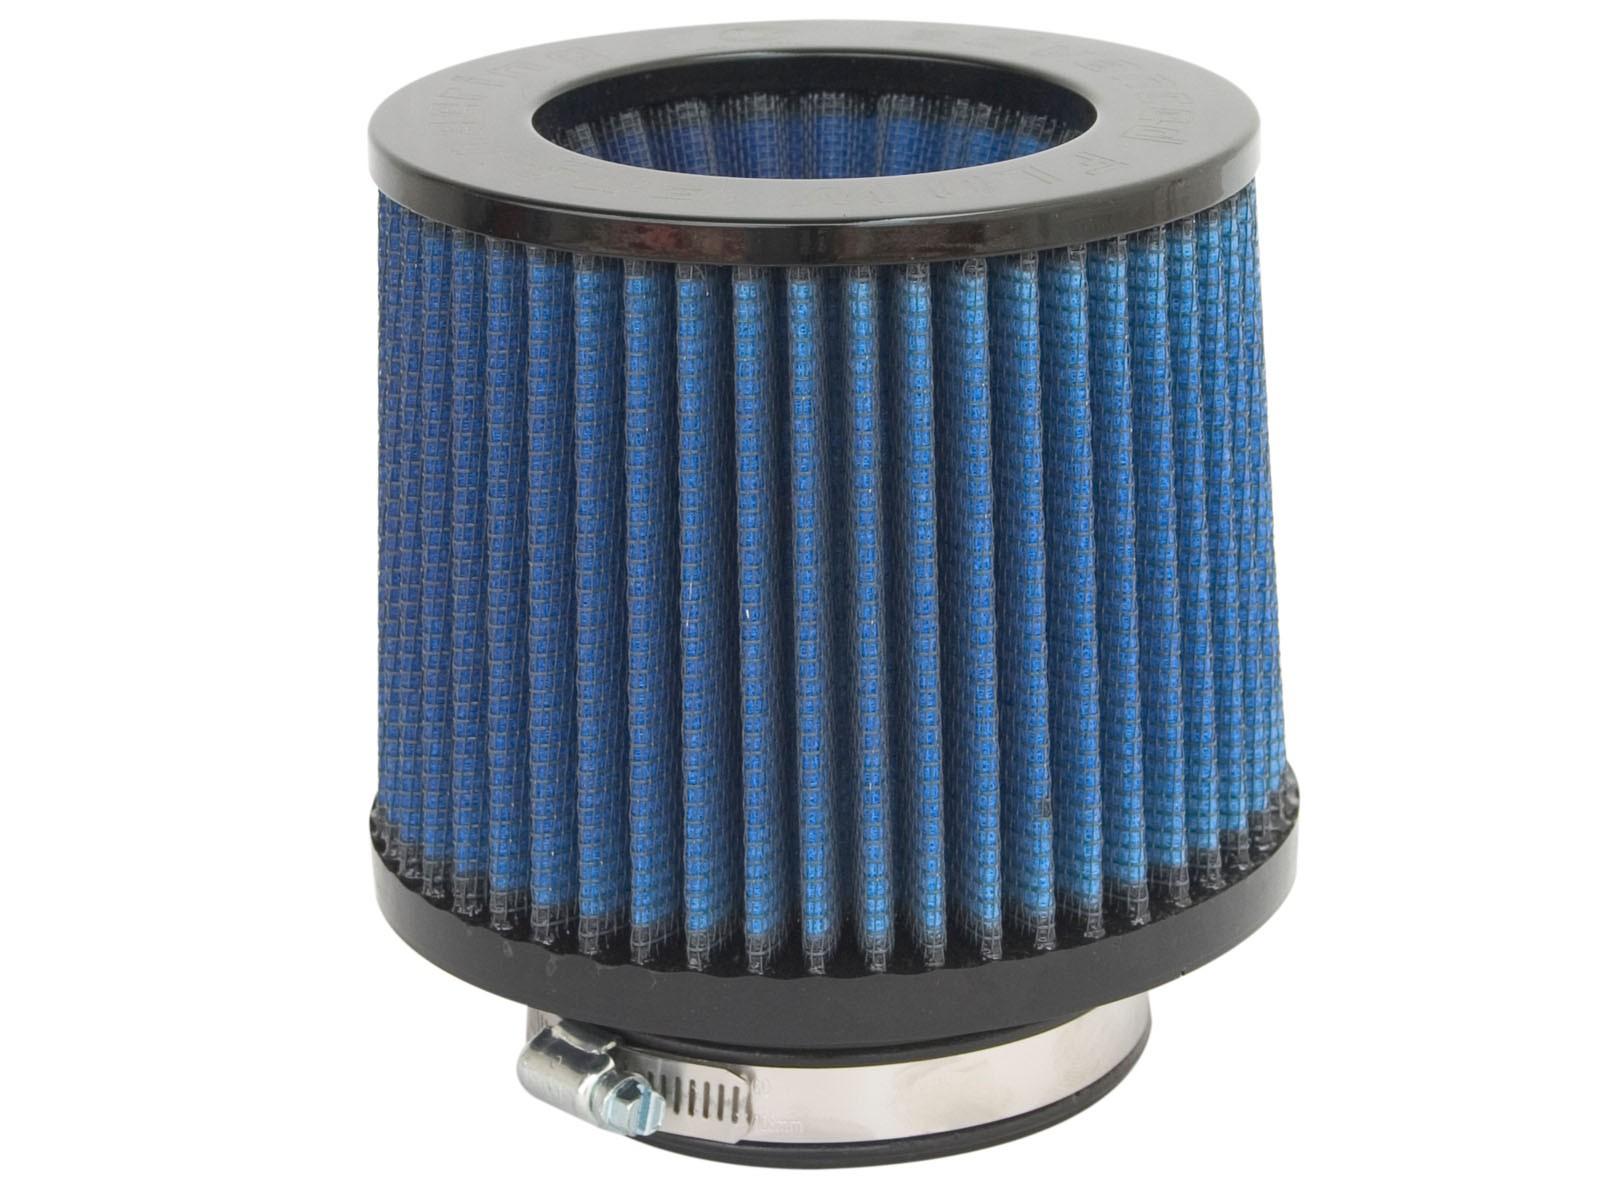 aFe POWER 24-91033 Magnum FLOW Pro 5R Air Filter